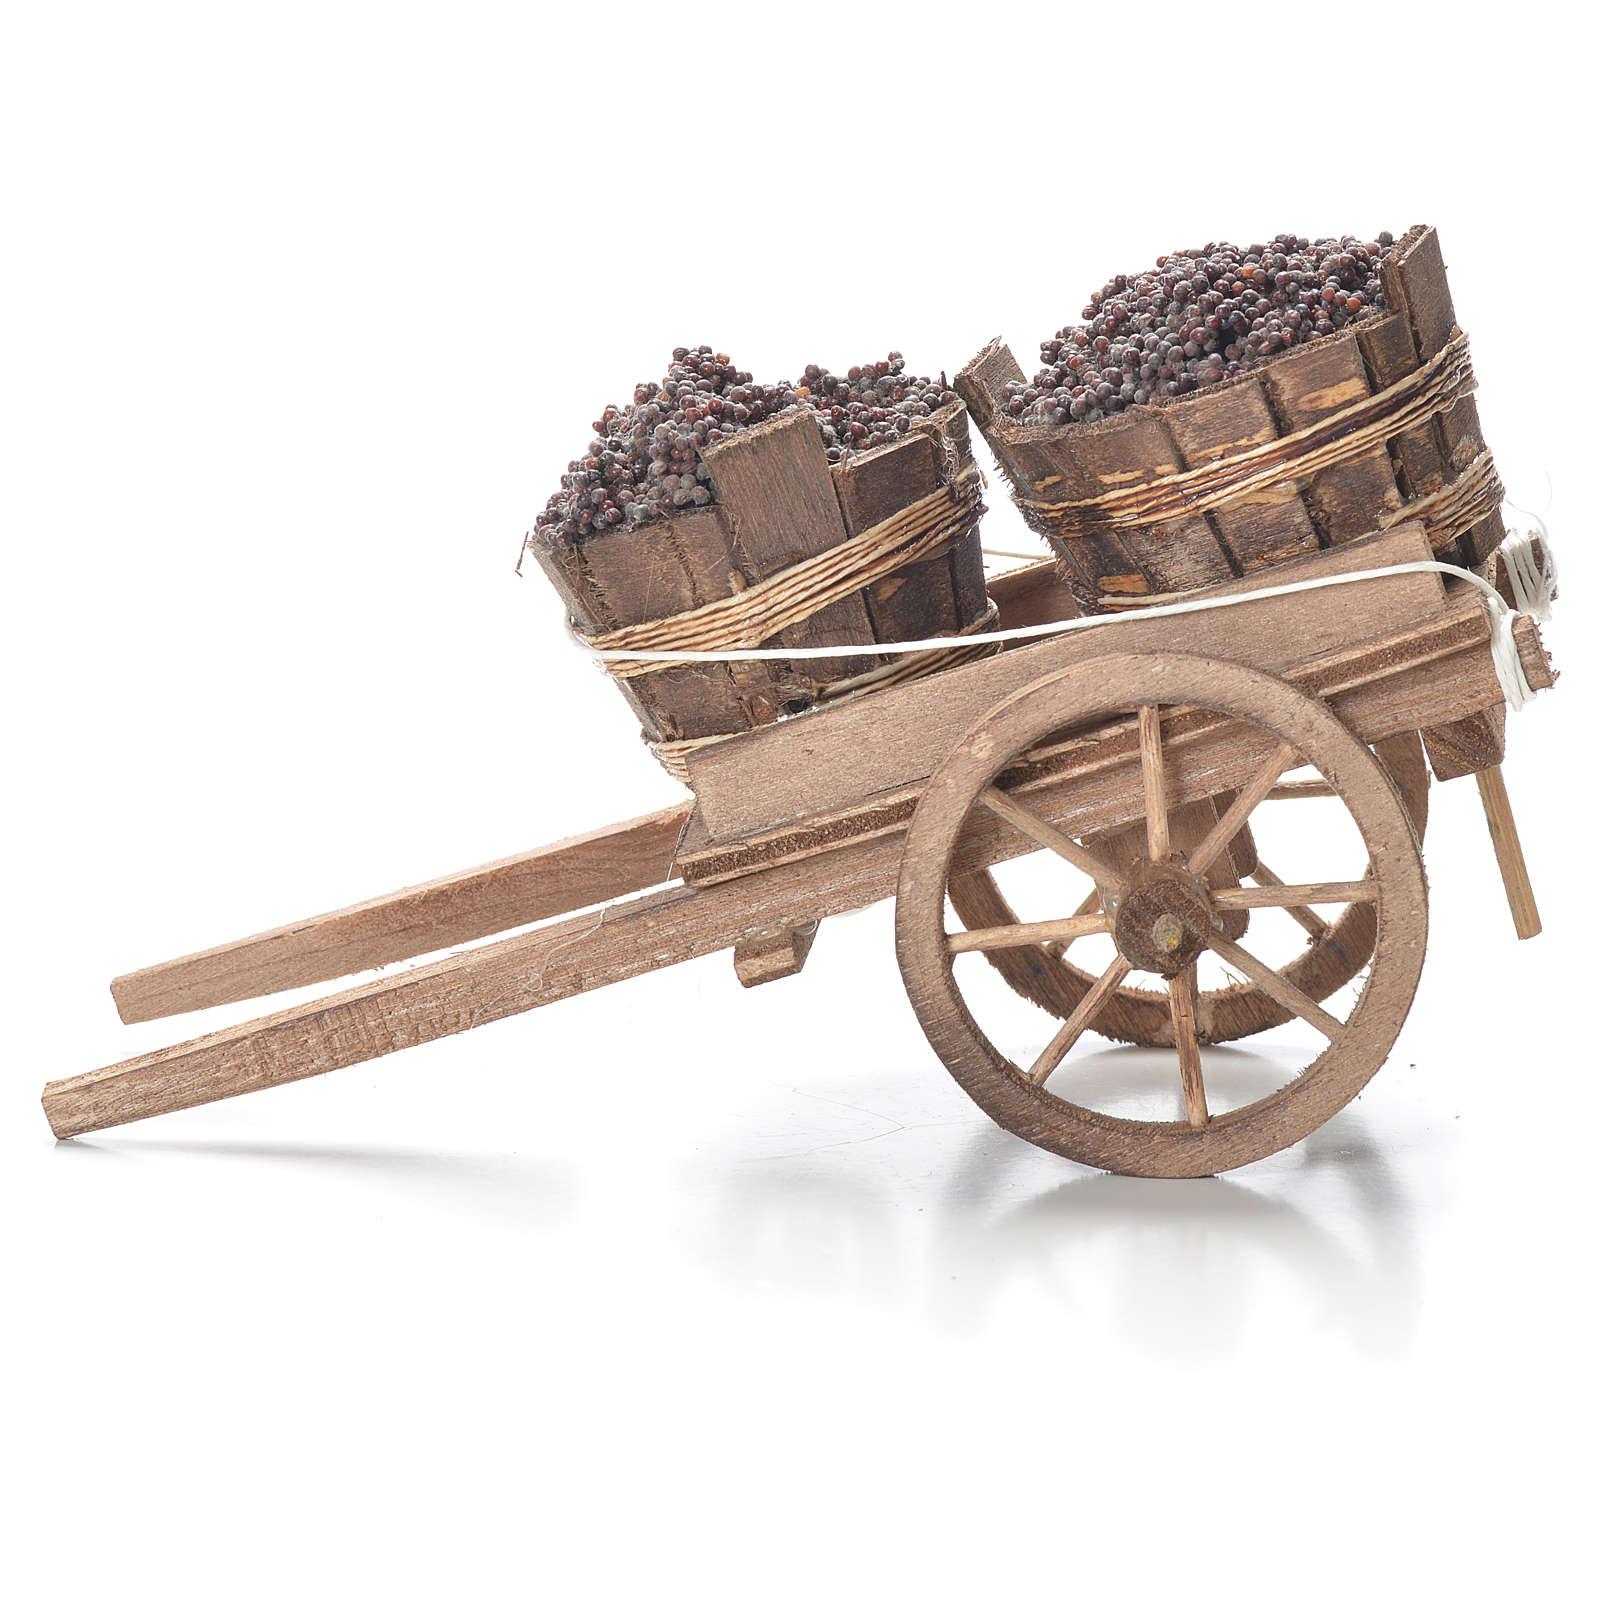 Cart with tubs, Neapolitan Nativity 10x18x8cm 4